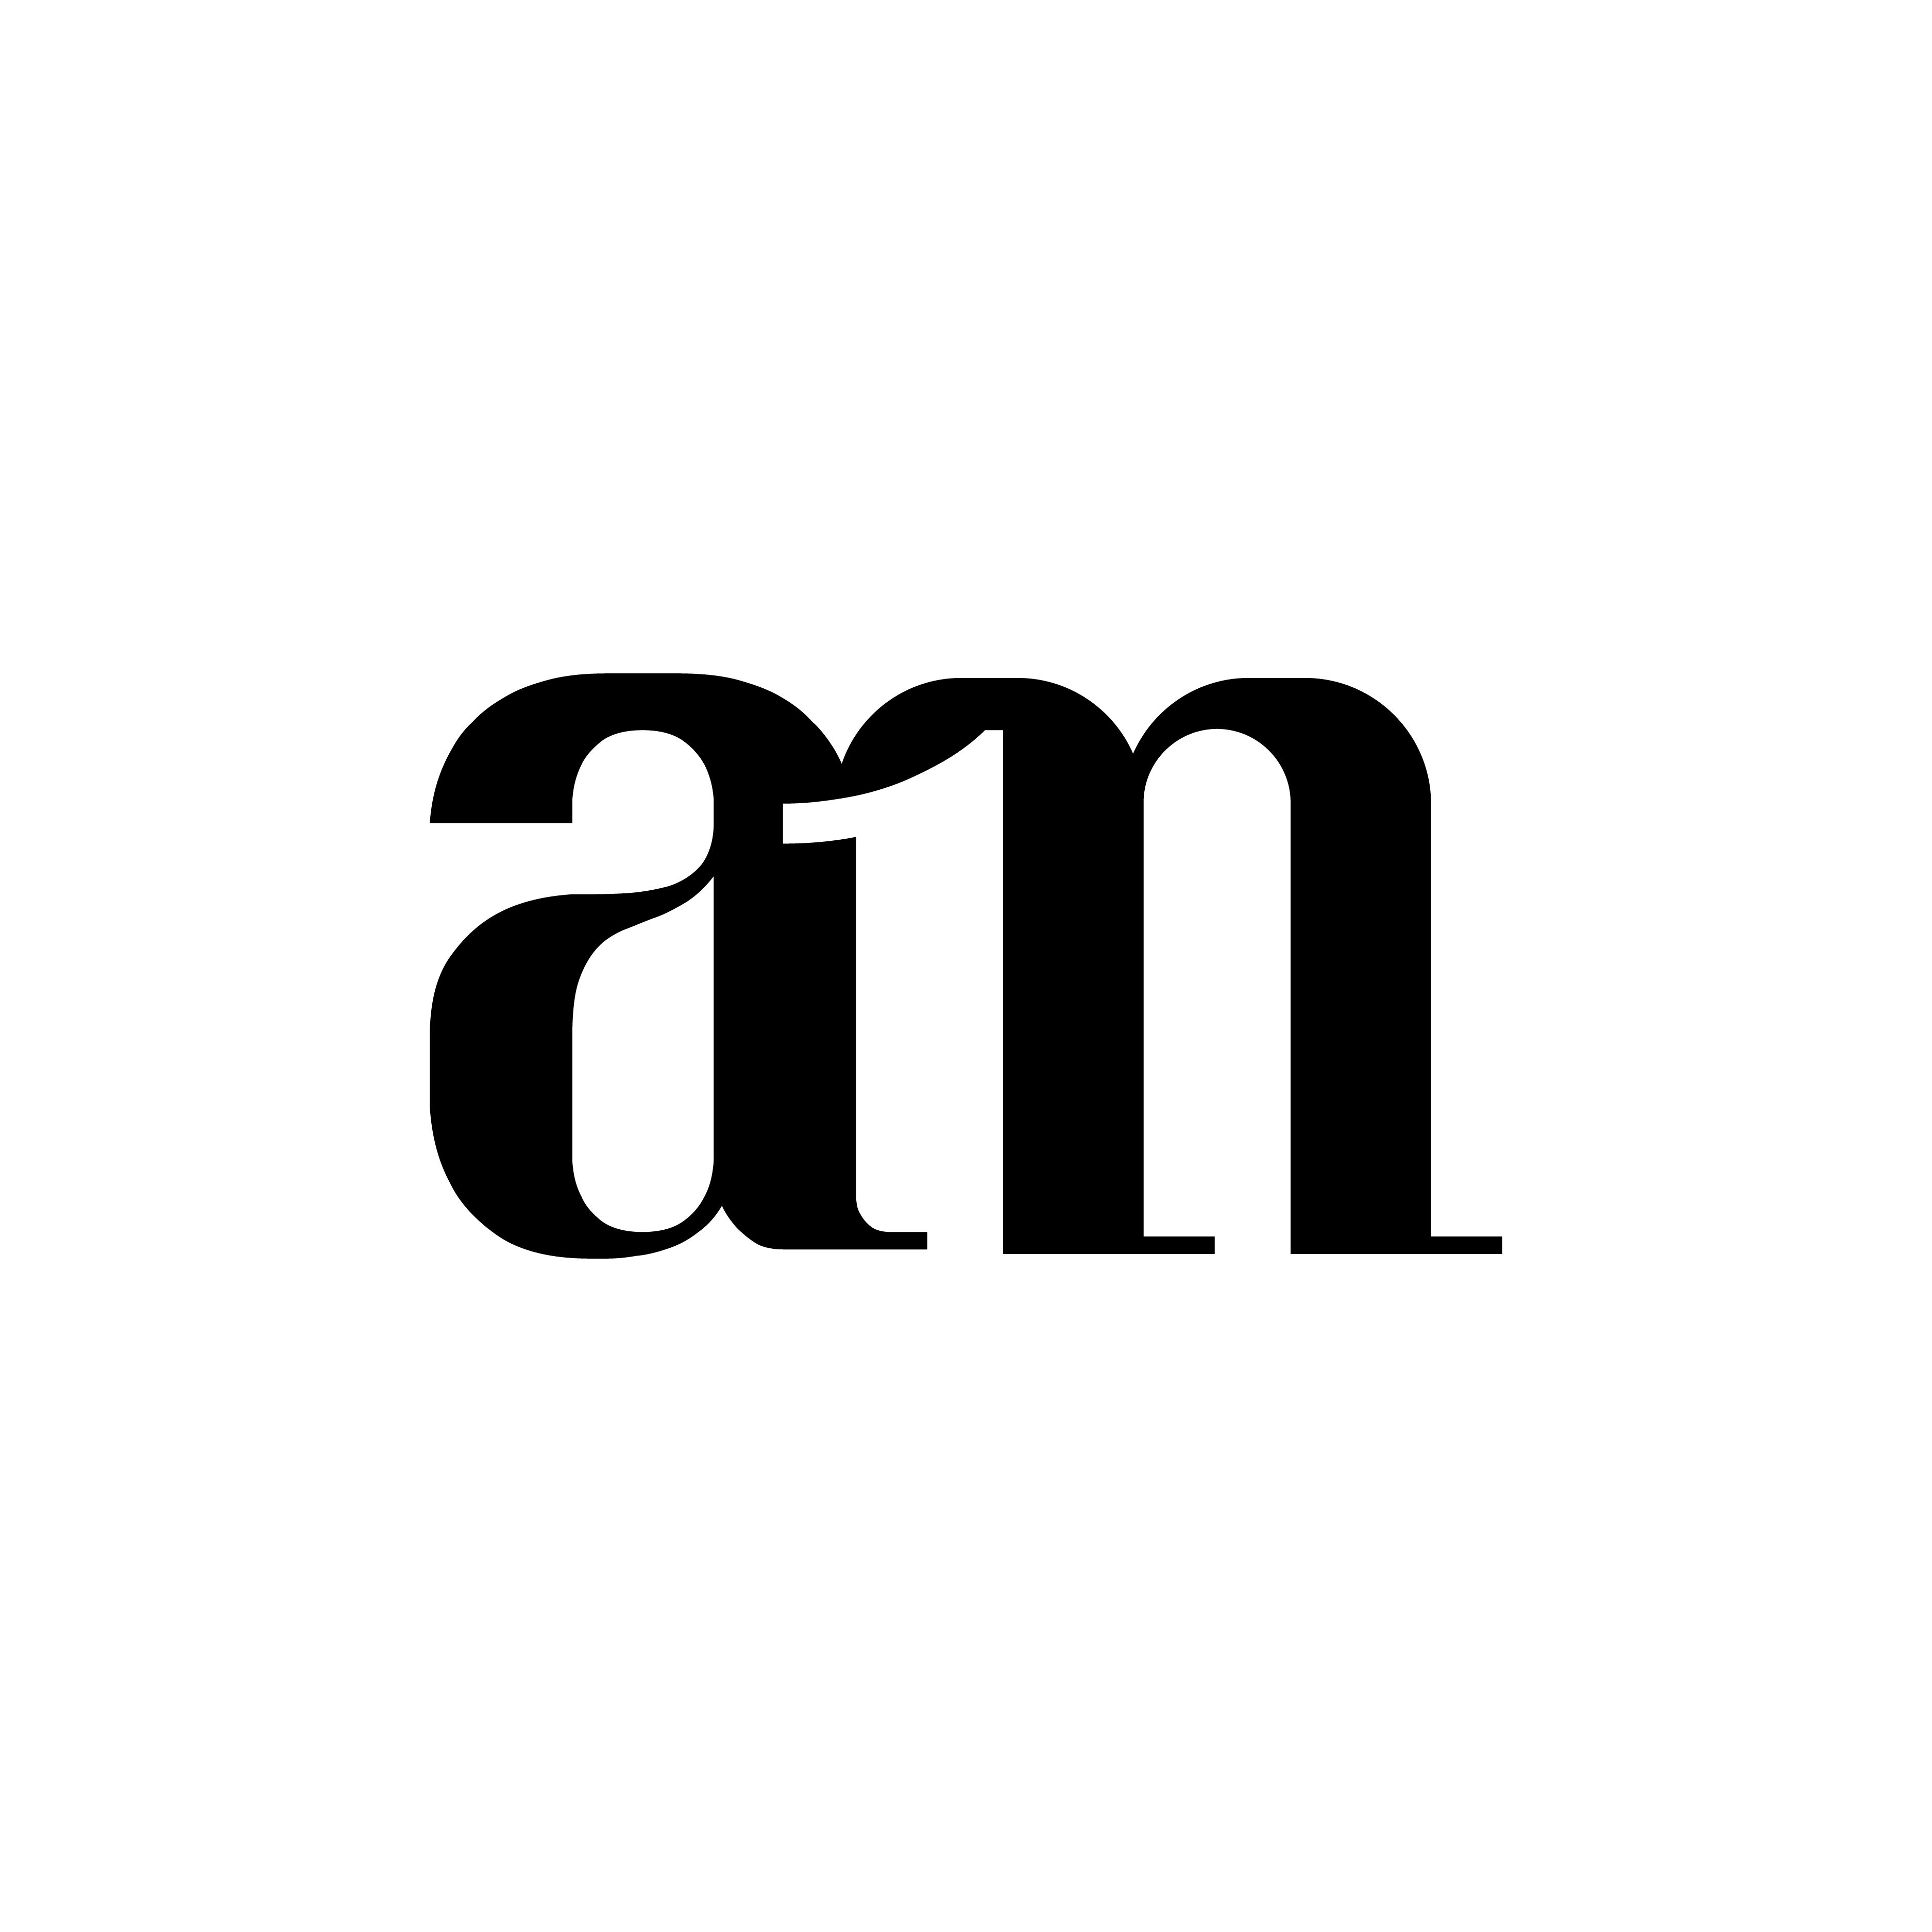 a1m logo design by logo designer Radu Moraru